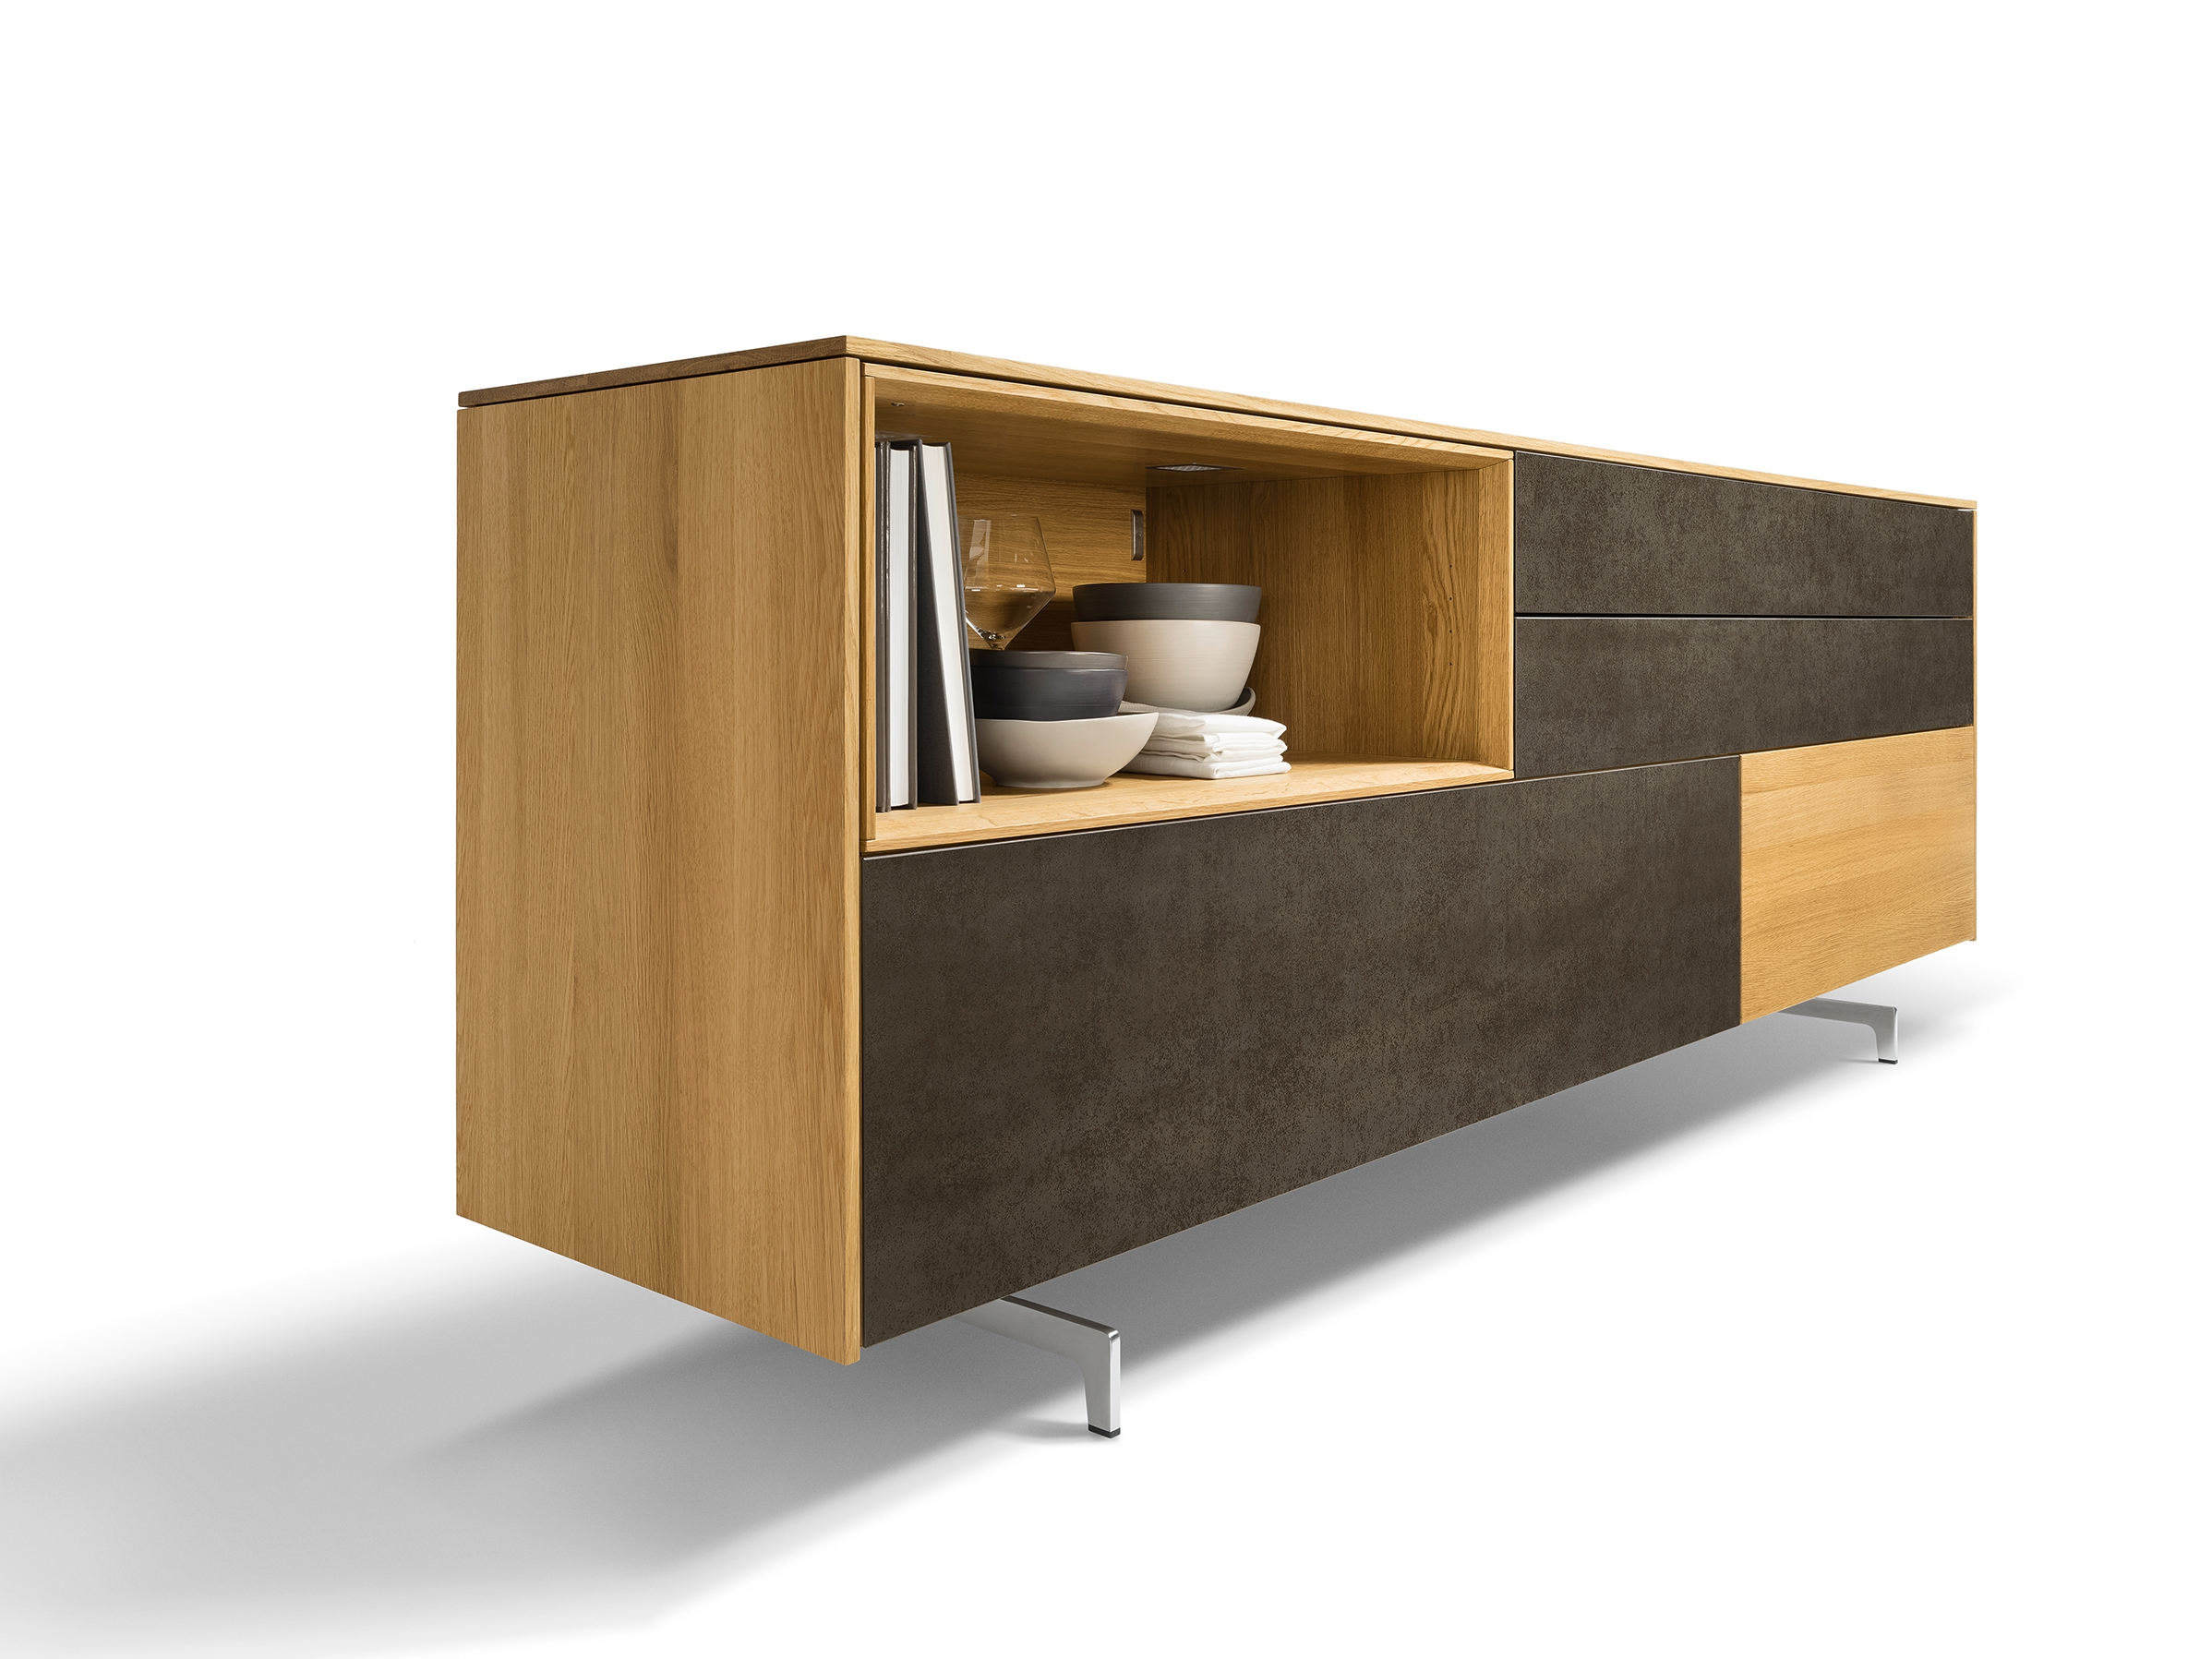 madia collezione filigno by team 7 nat rlich wohnen design sebastian desch. Black Bedroom Furniture Sets. Home Design Ideas